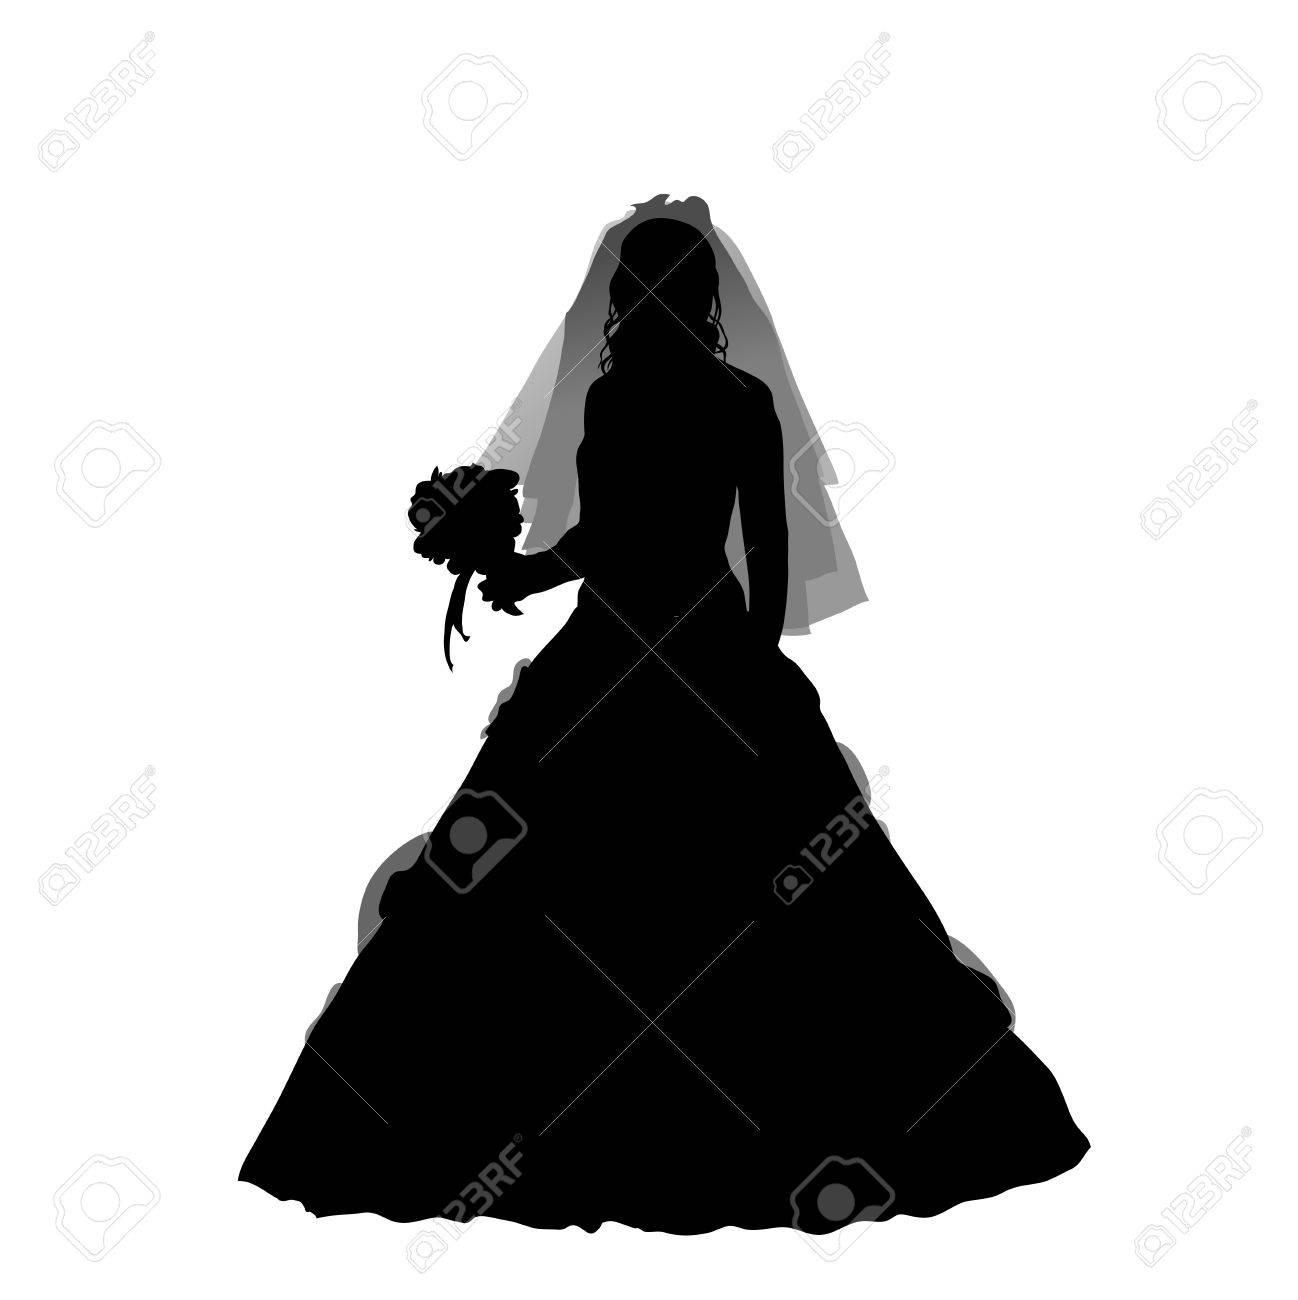 bride silhouette on the white background, vector illustration Stock Vector - 9757259